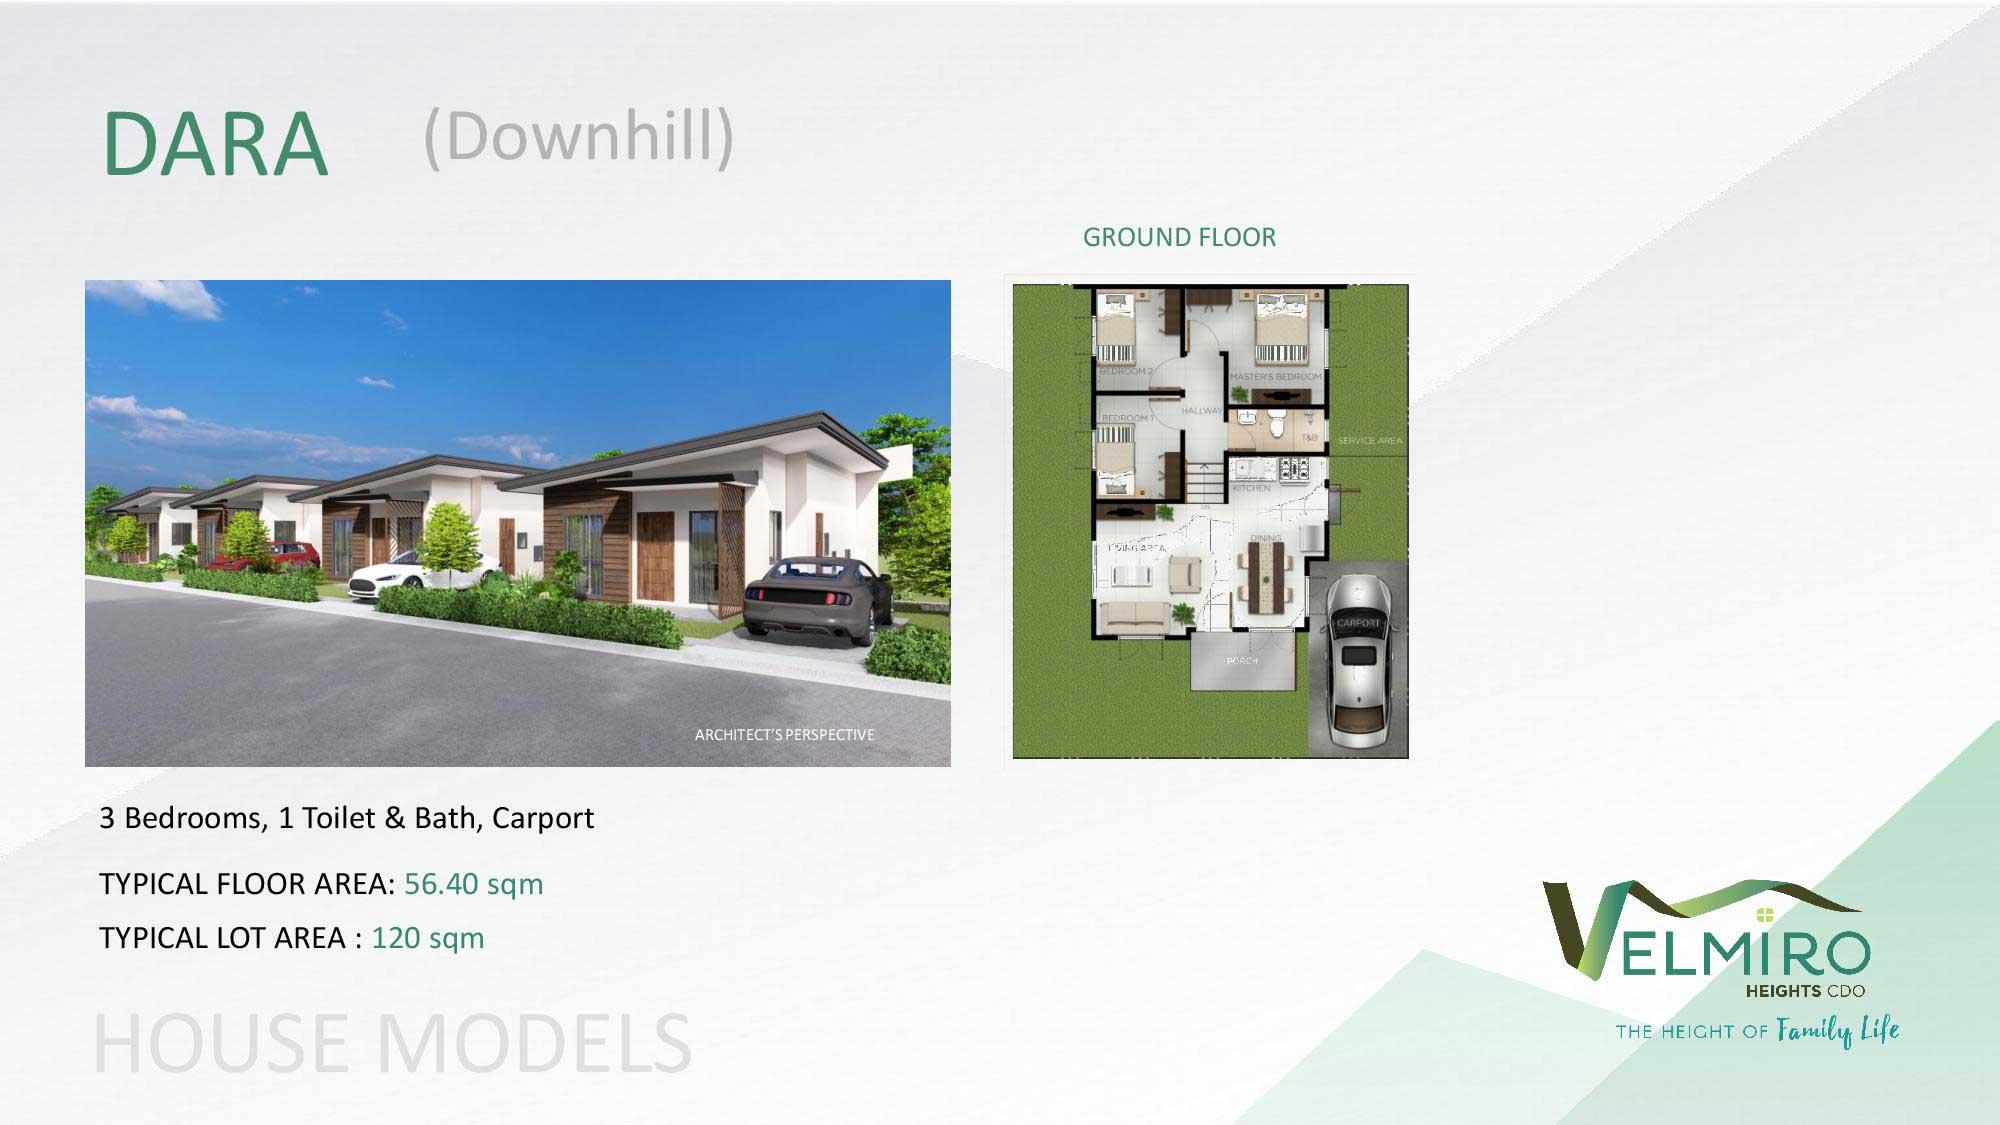 Velmiro heights agusan house model dara downhill web gmc